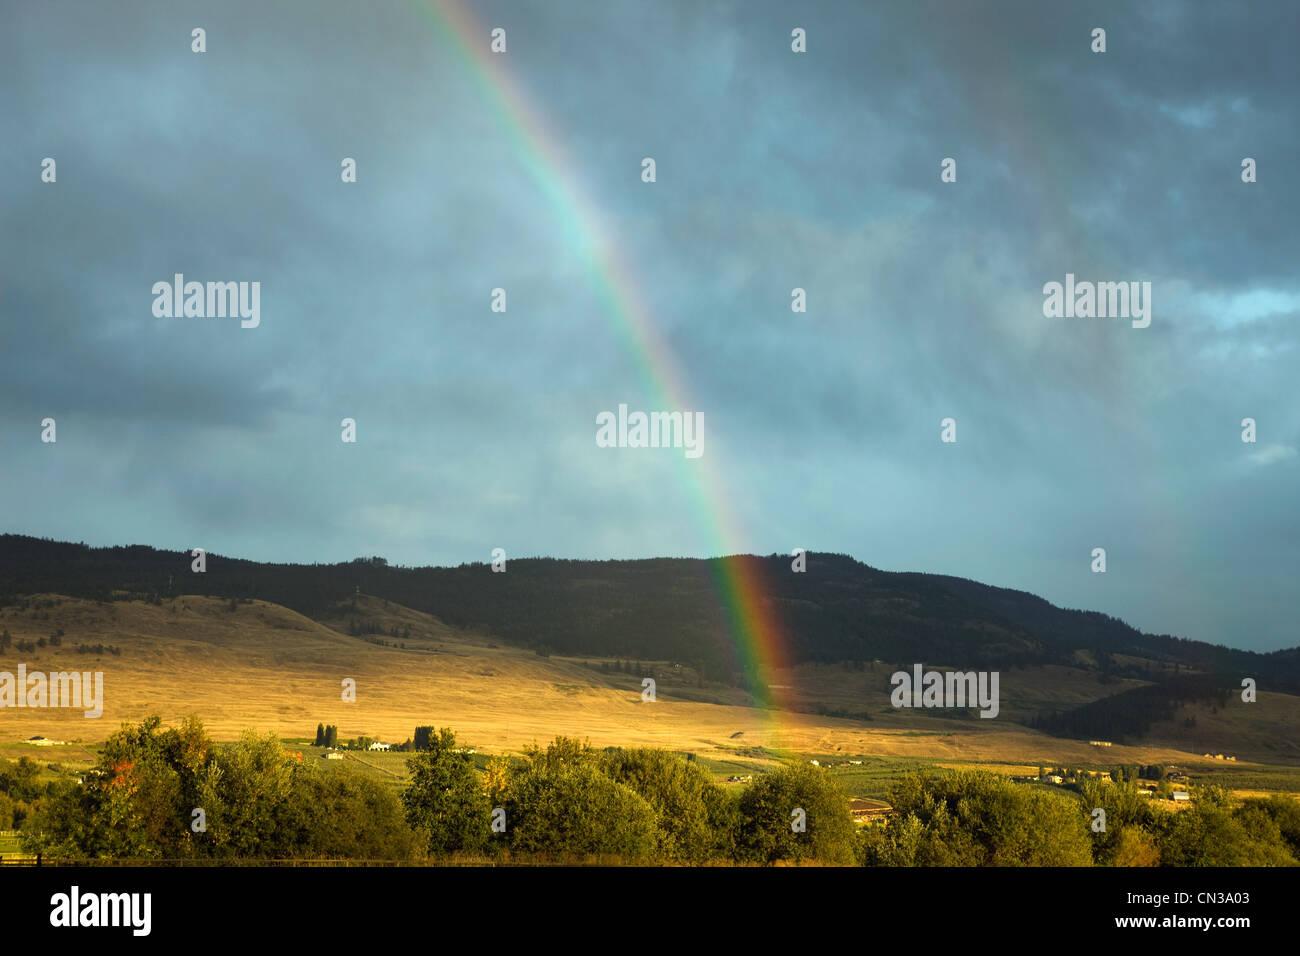 Regenbogen über malerische Landschaft, Britisch-Kolumbien, Kanada Stockbild